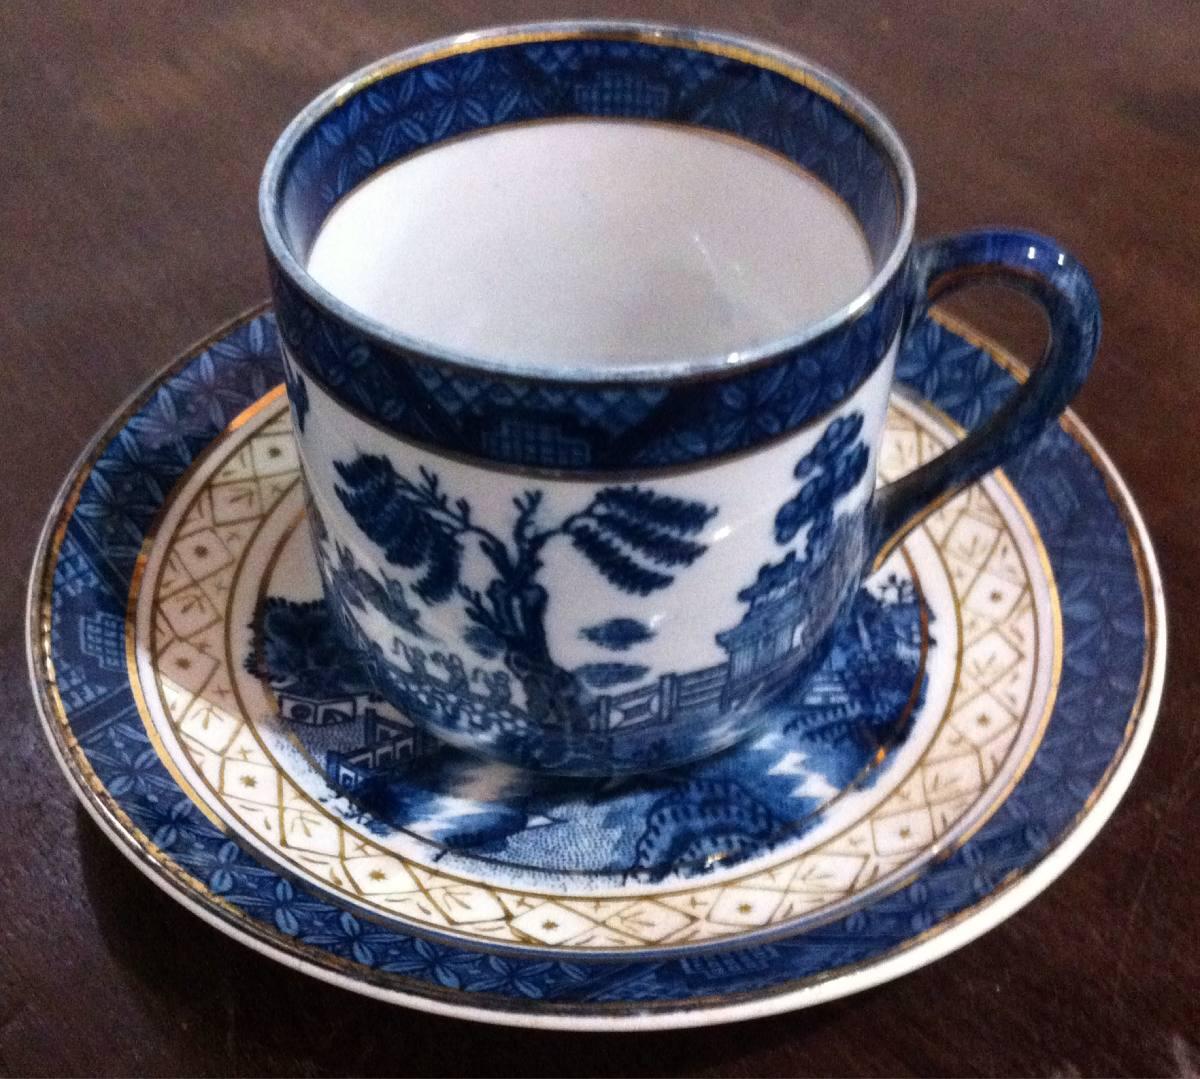 azul-pombinho-xicara-cafe-antiga-794401-MLB20341857153_072015-F